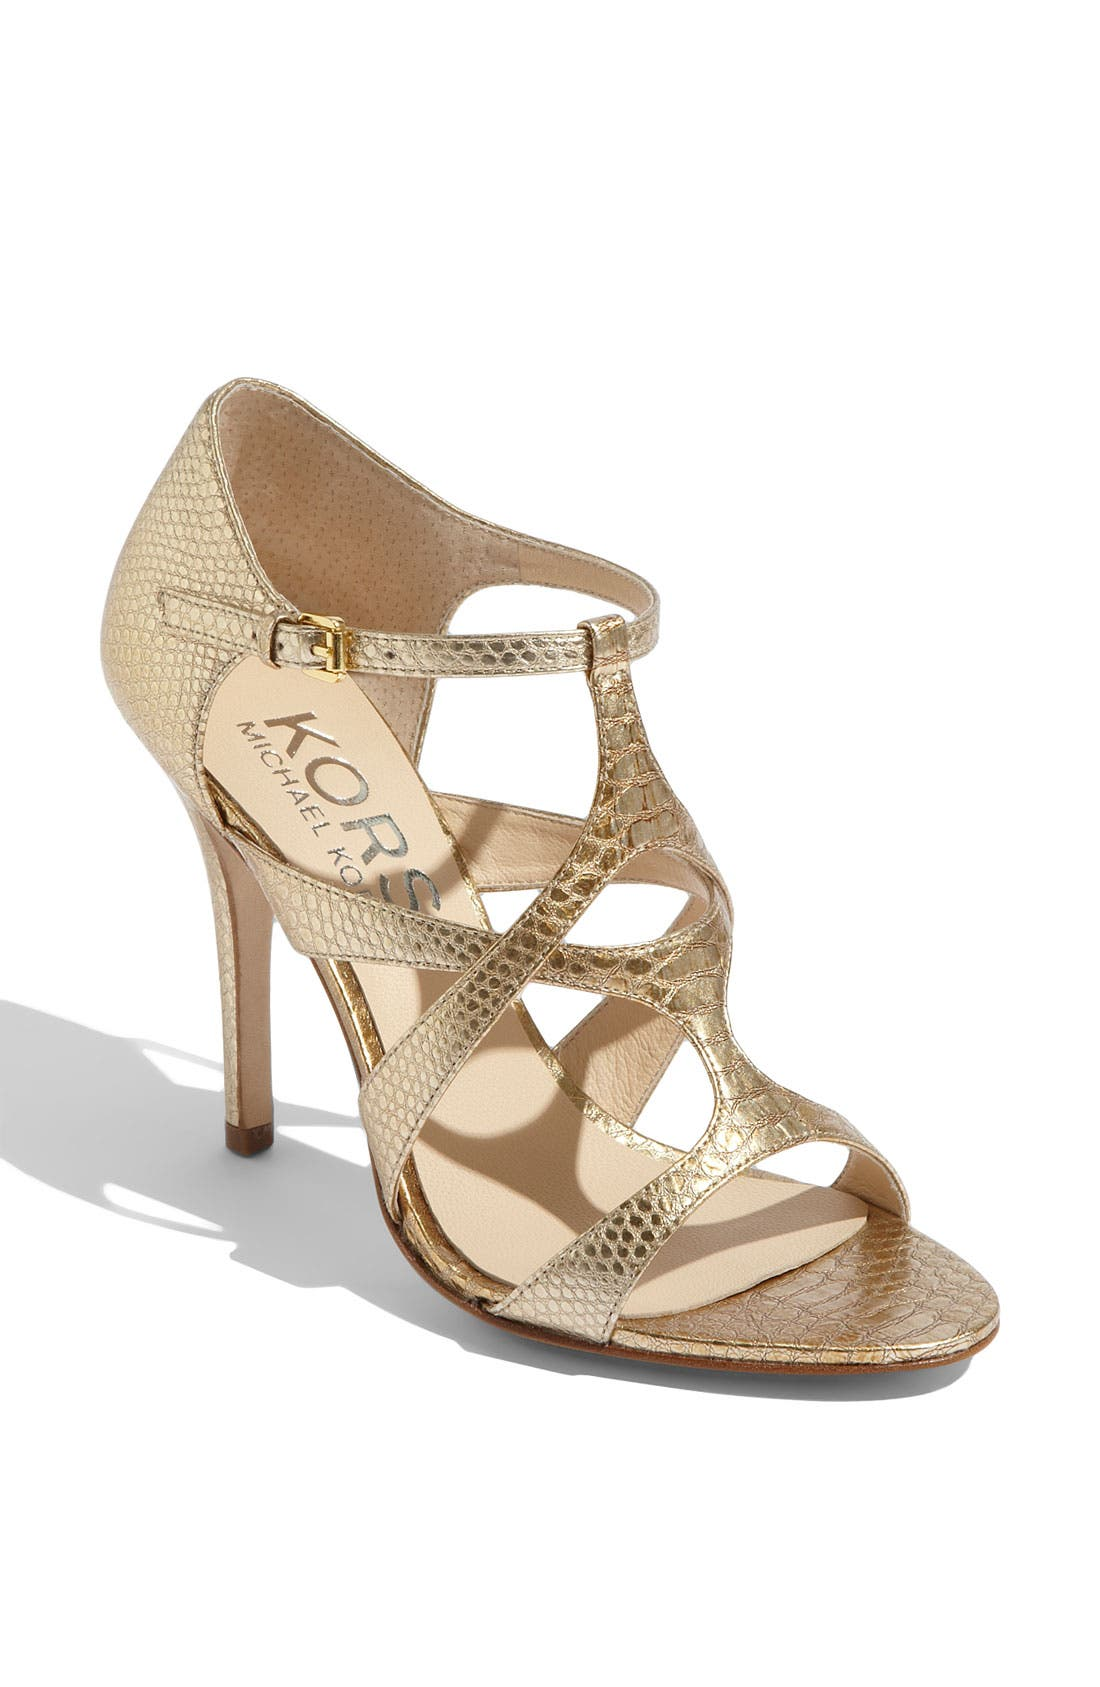 Alternate Image 1 Selected - KORS Michael Kors 'Sasha' Sandal